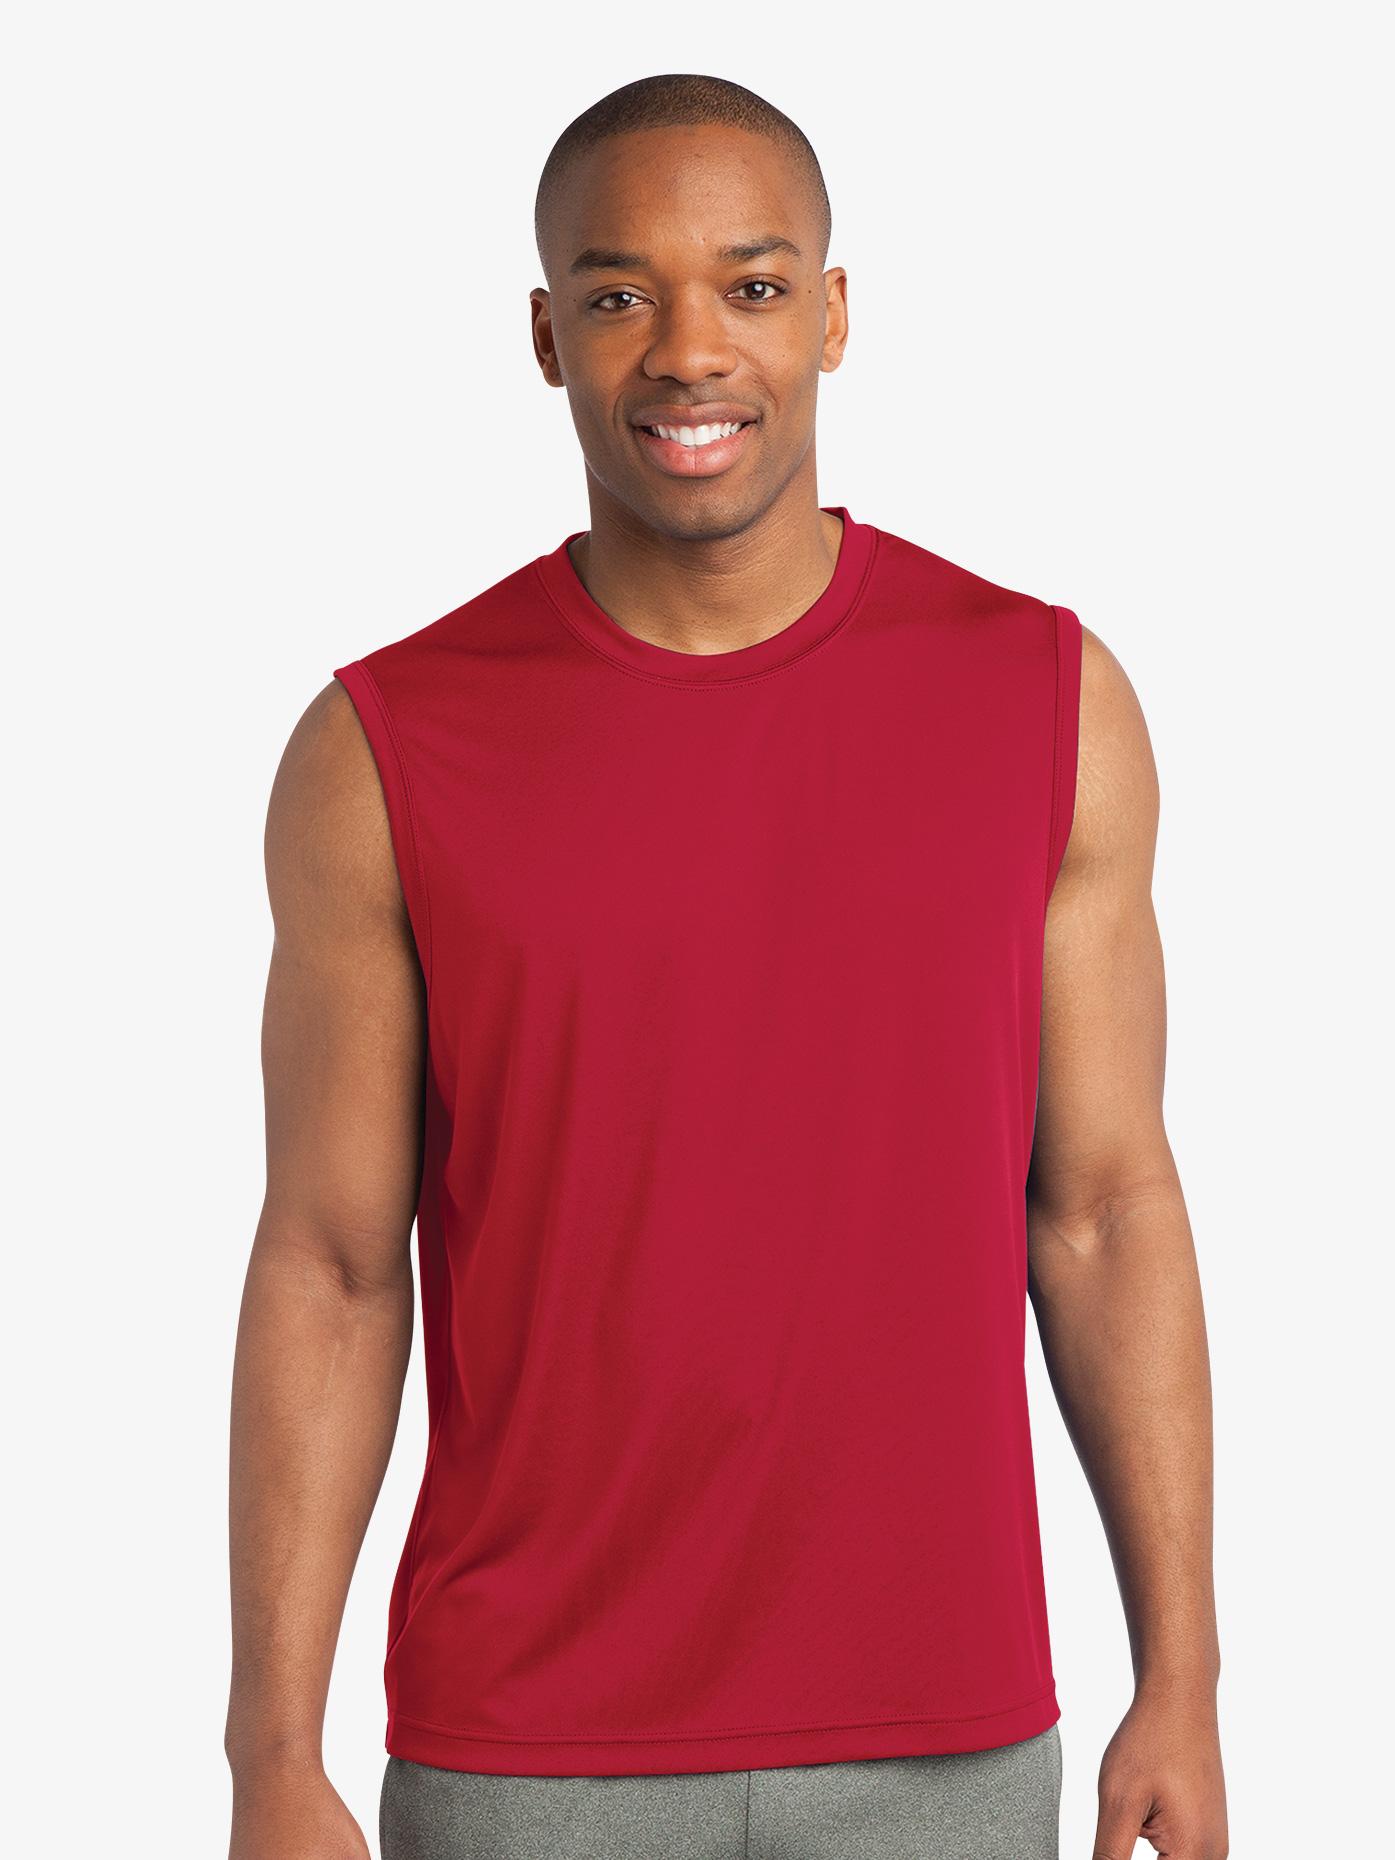 B-YOU Mens Sleeveless T-Shirt ST352